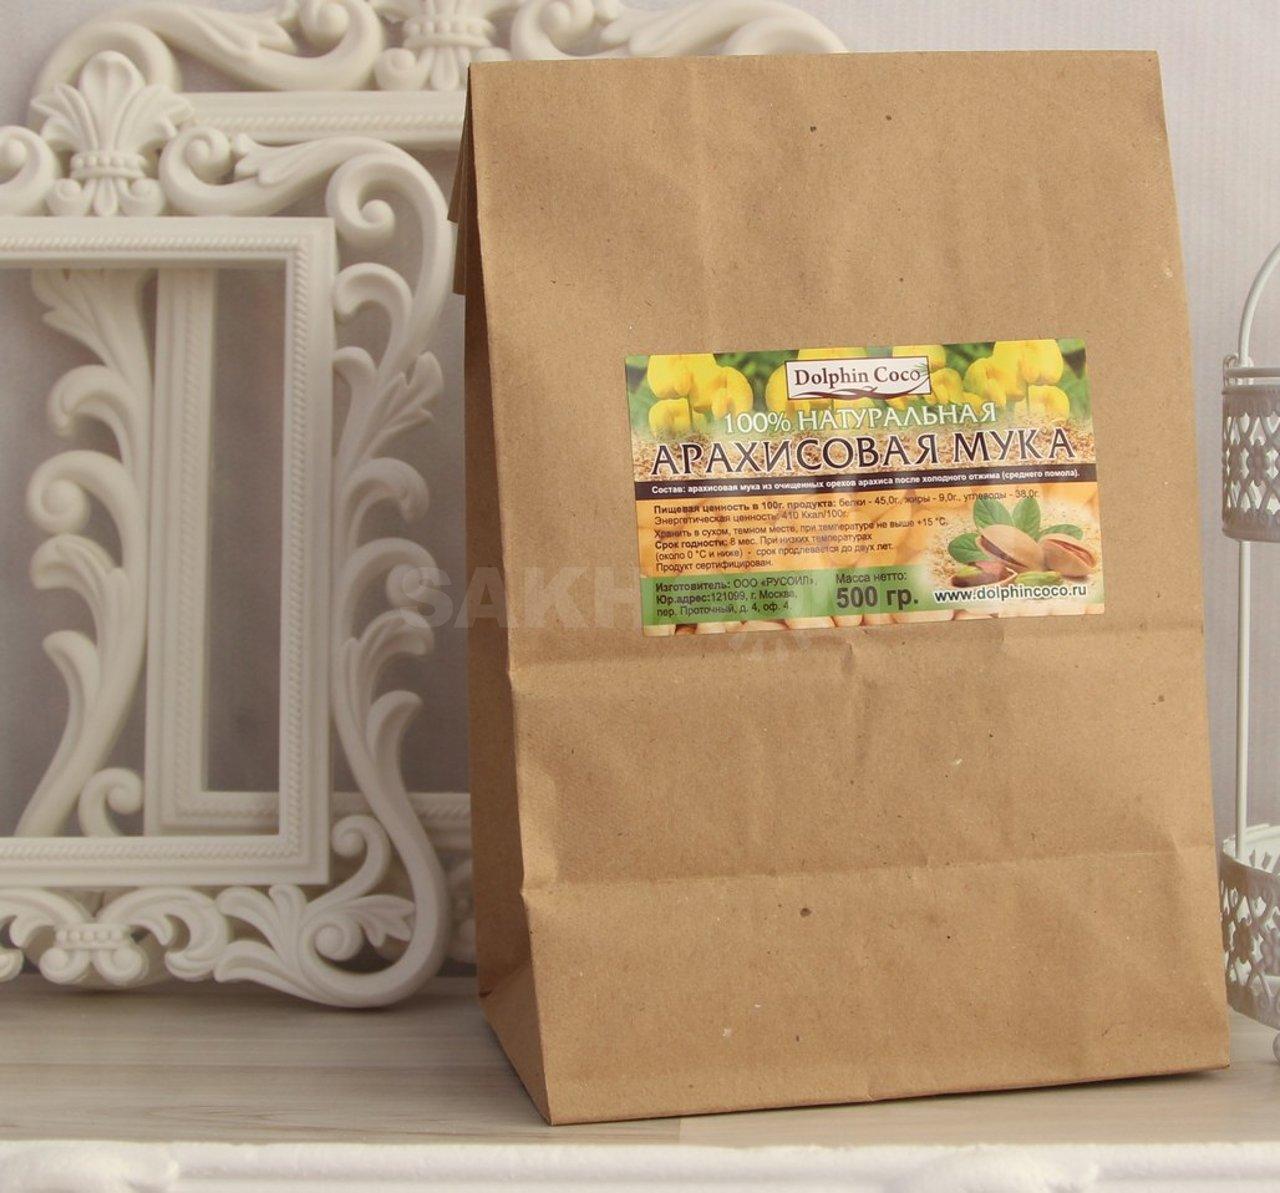 мука арахисовая (уп.500 гр)